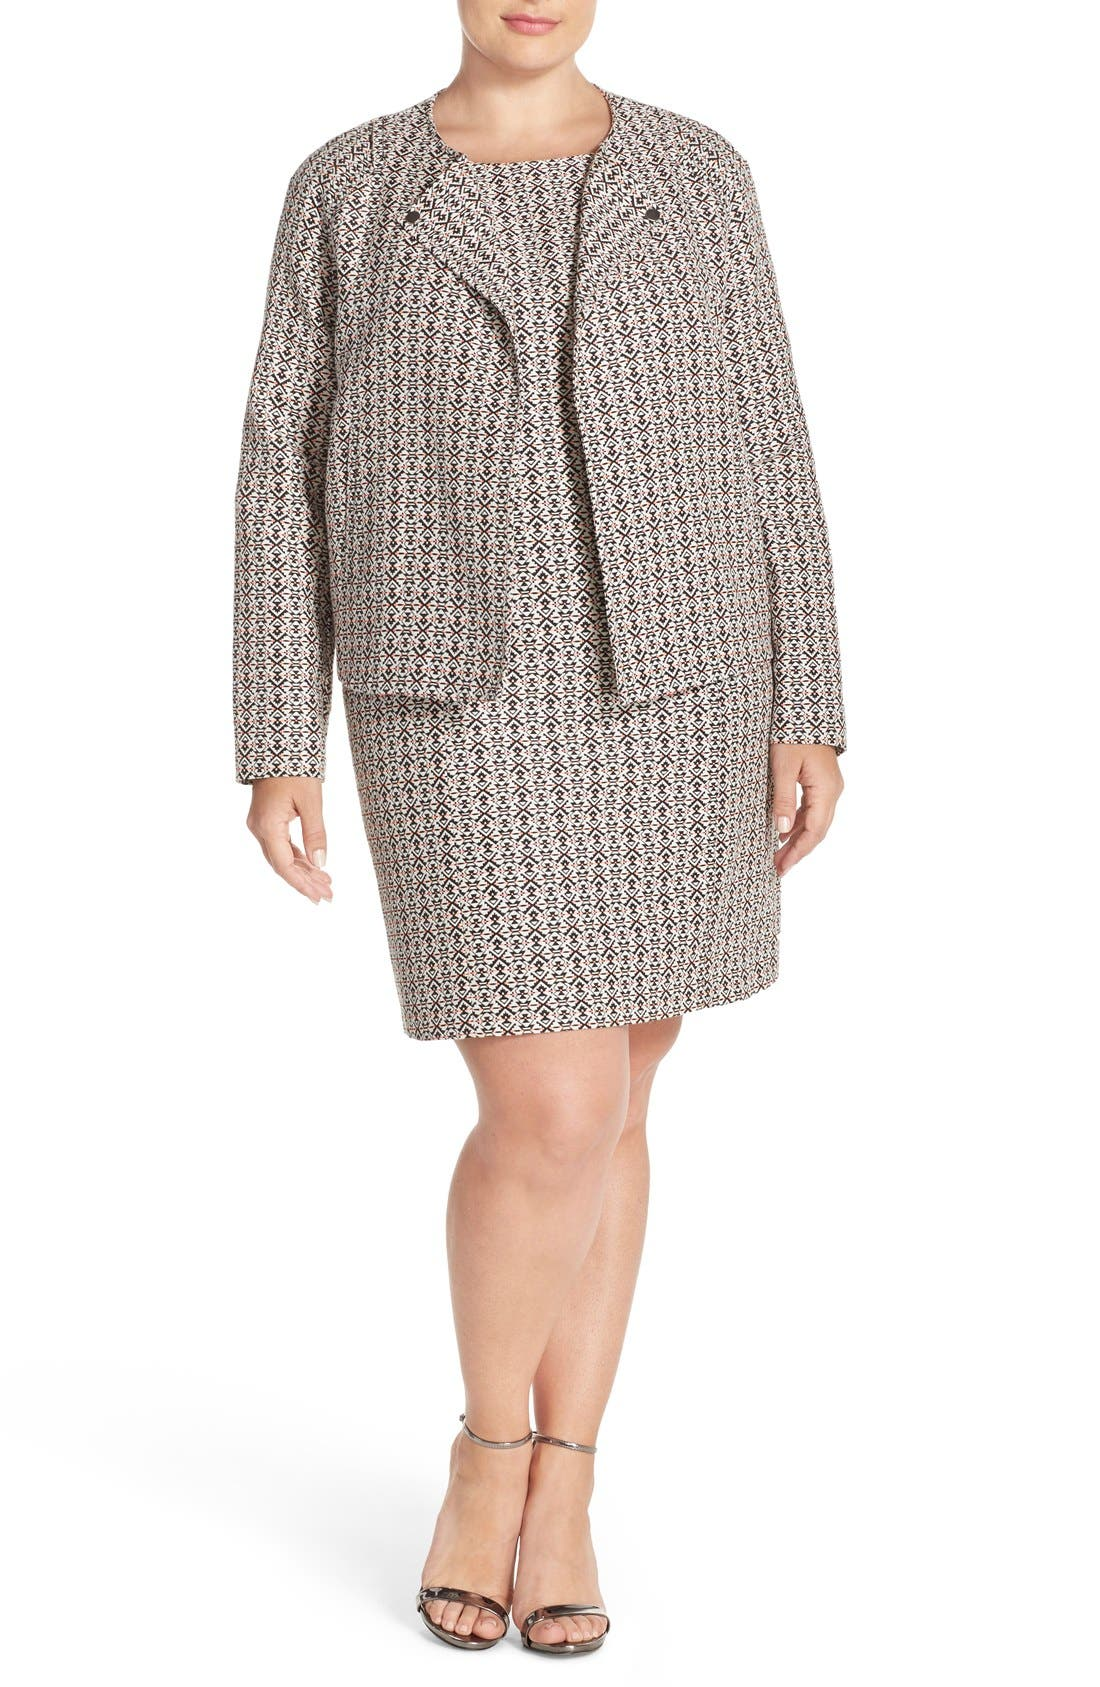 Alternate Image 3  - Tart 'Aviana' Print Collarless Jacket (Plus Size)